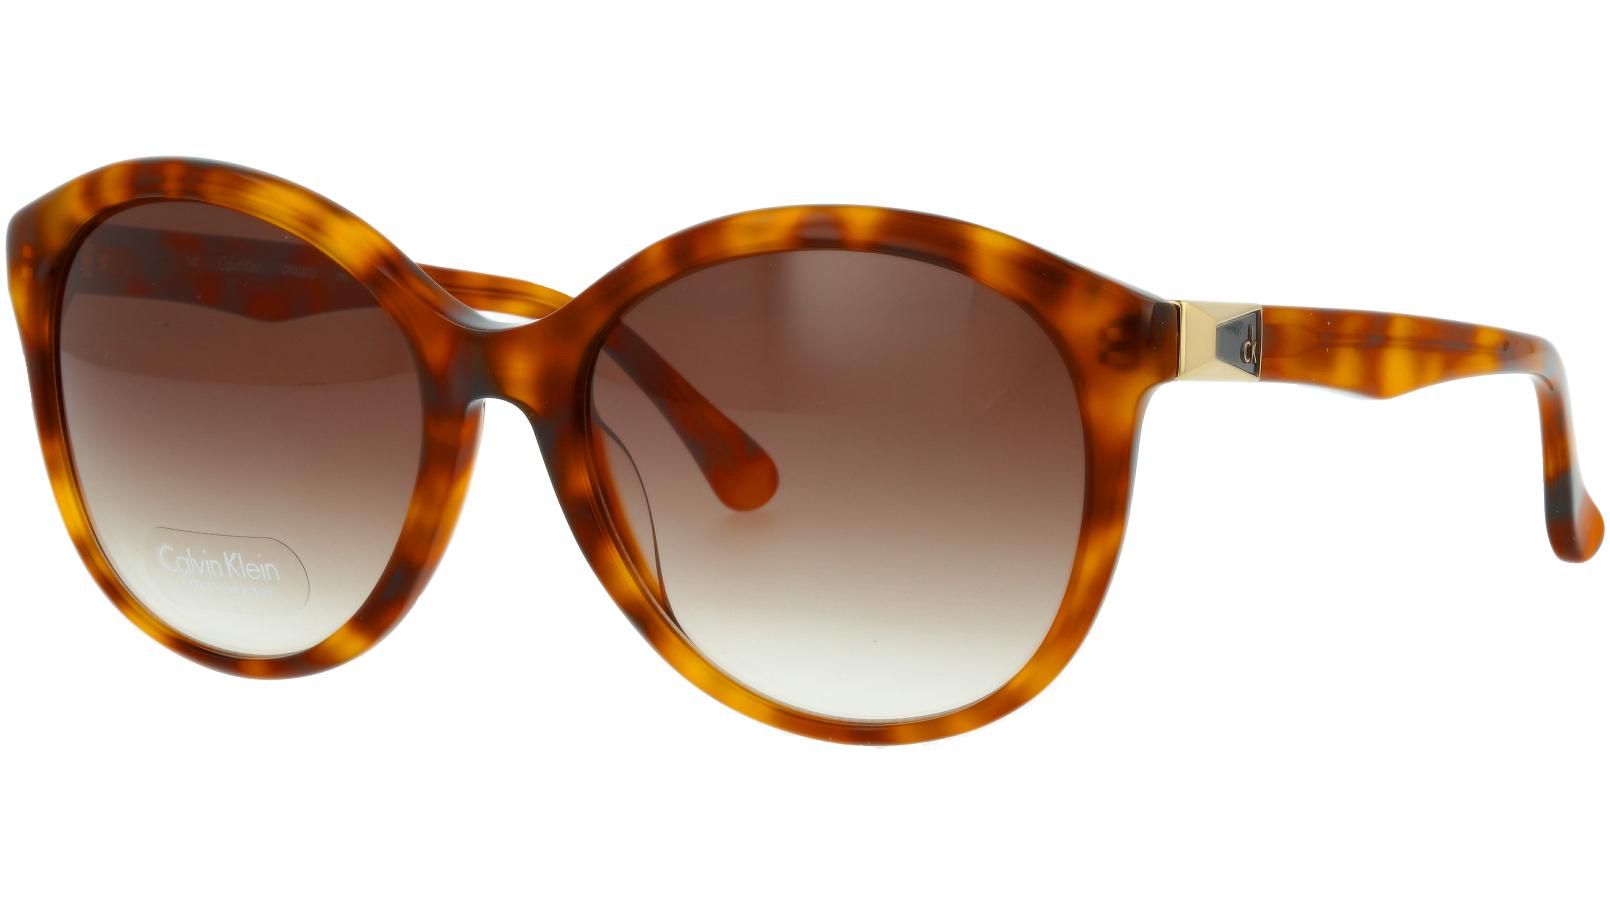 Calvin Klein CK4291S 211 57 Havana Sunglasses